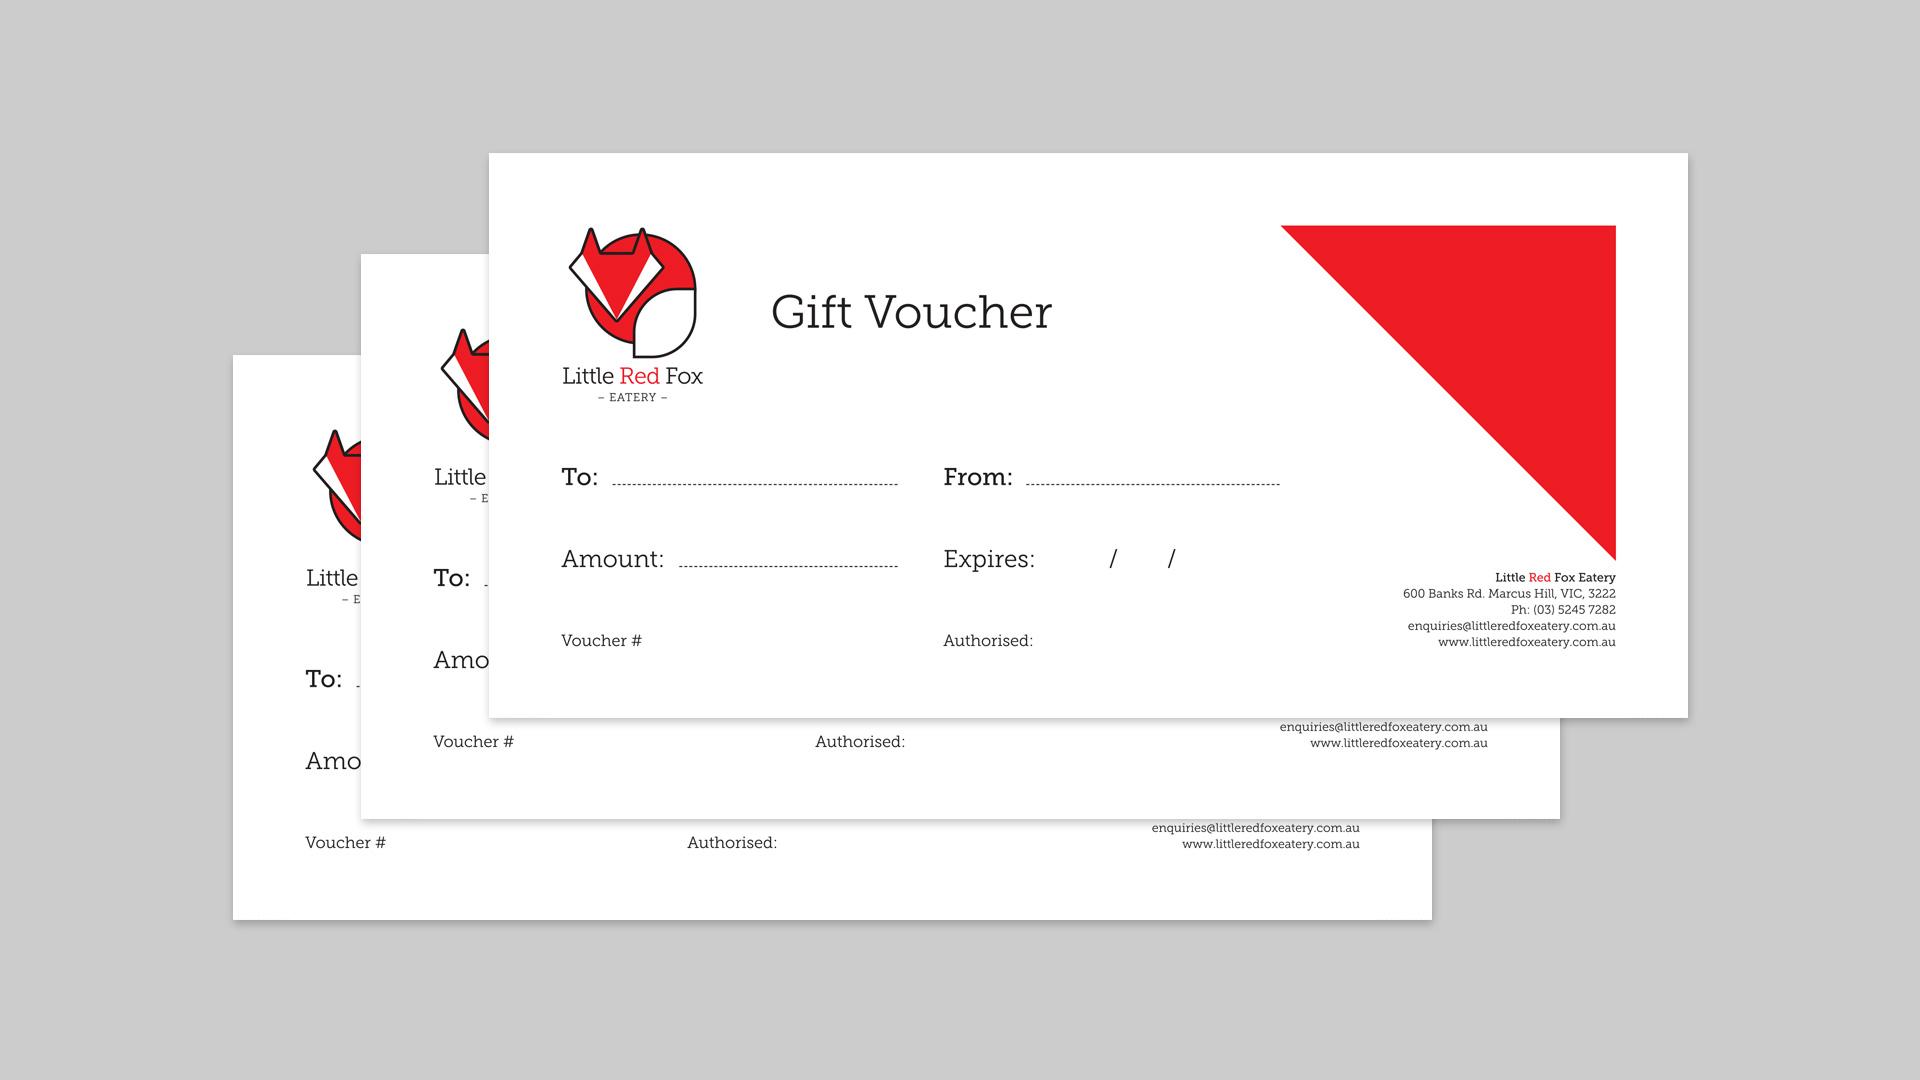 Little Red Fox Eatery gift voucher